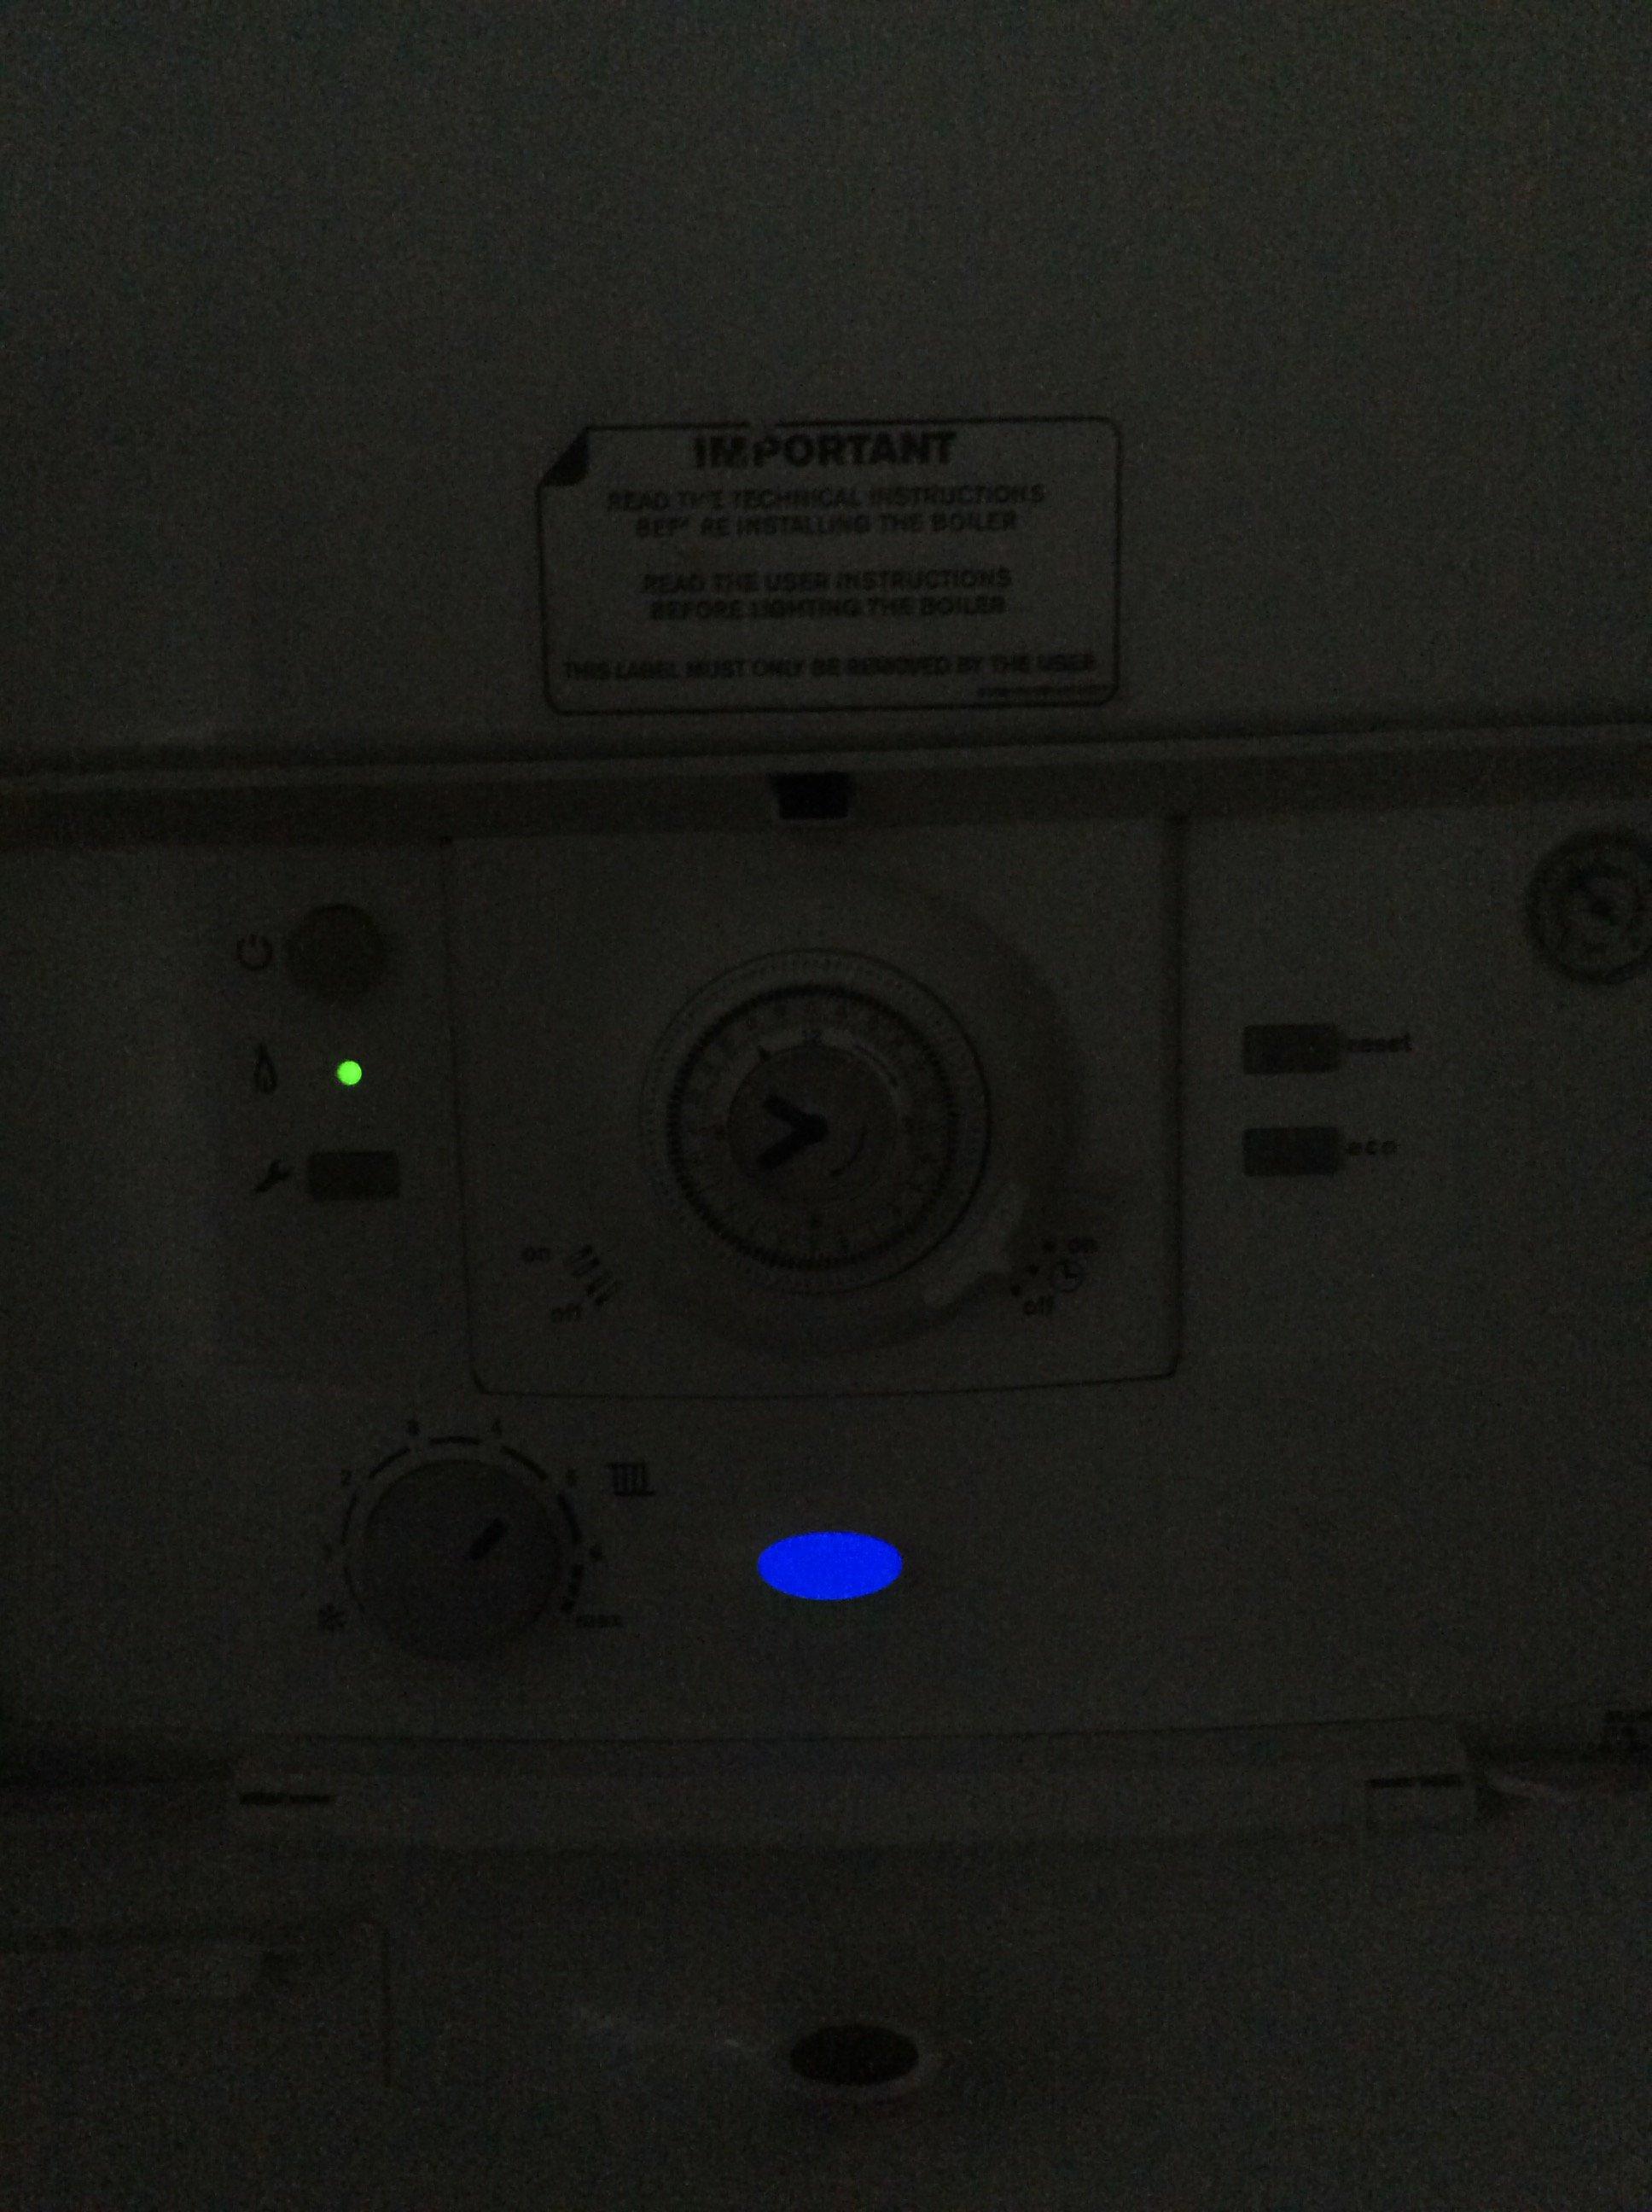 Aube Underfloor Heating Thermostat Problems Carpet